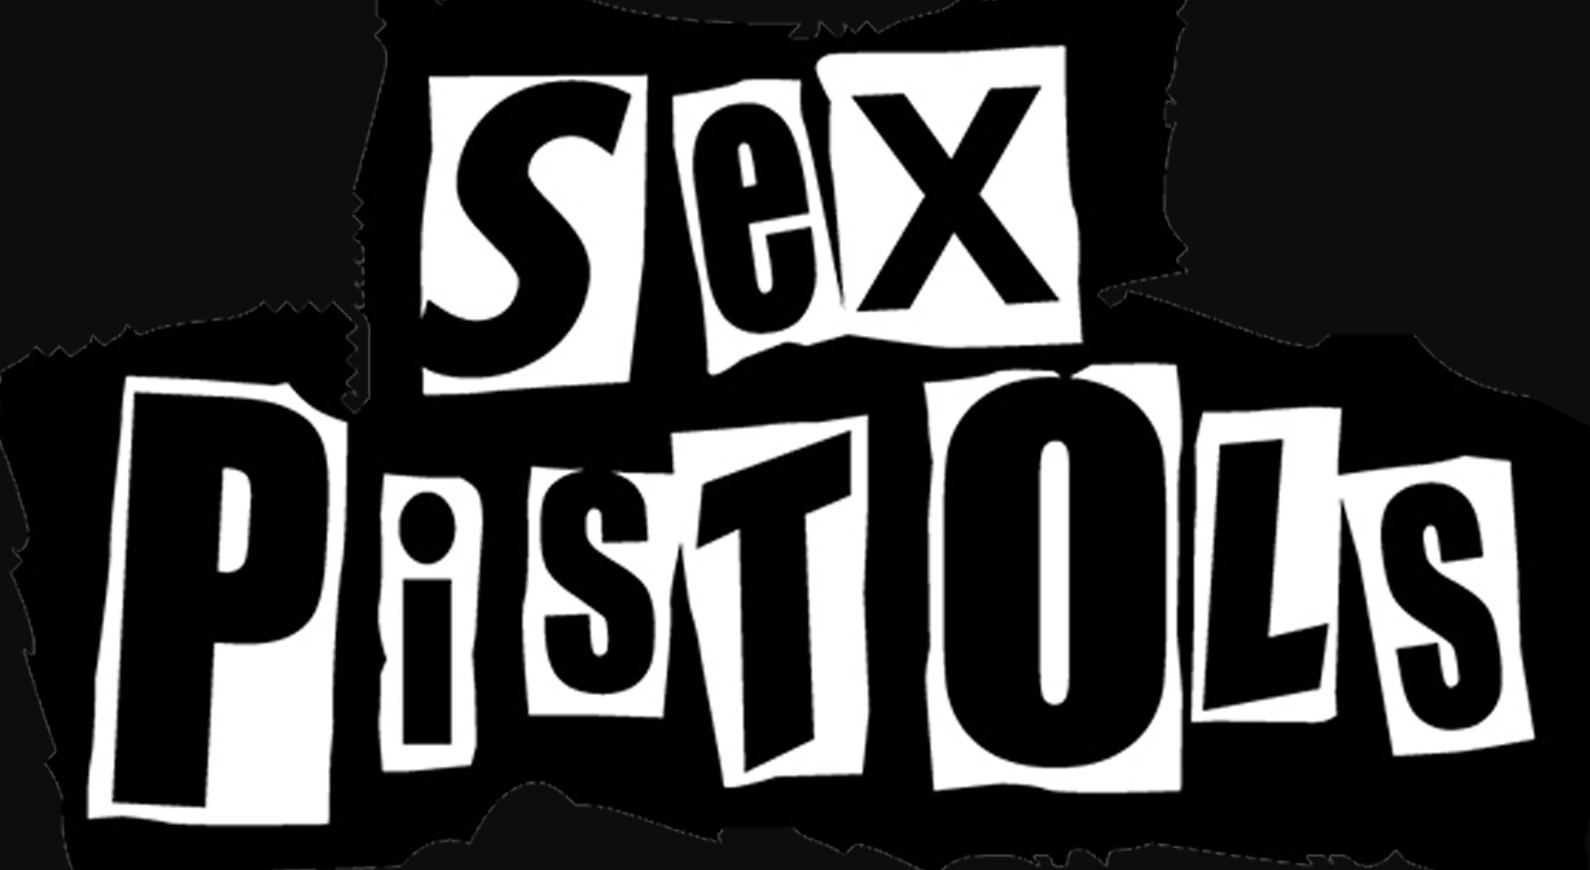 Sex Pistol S 83